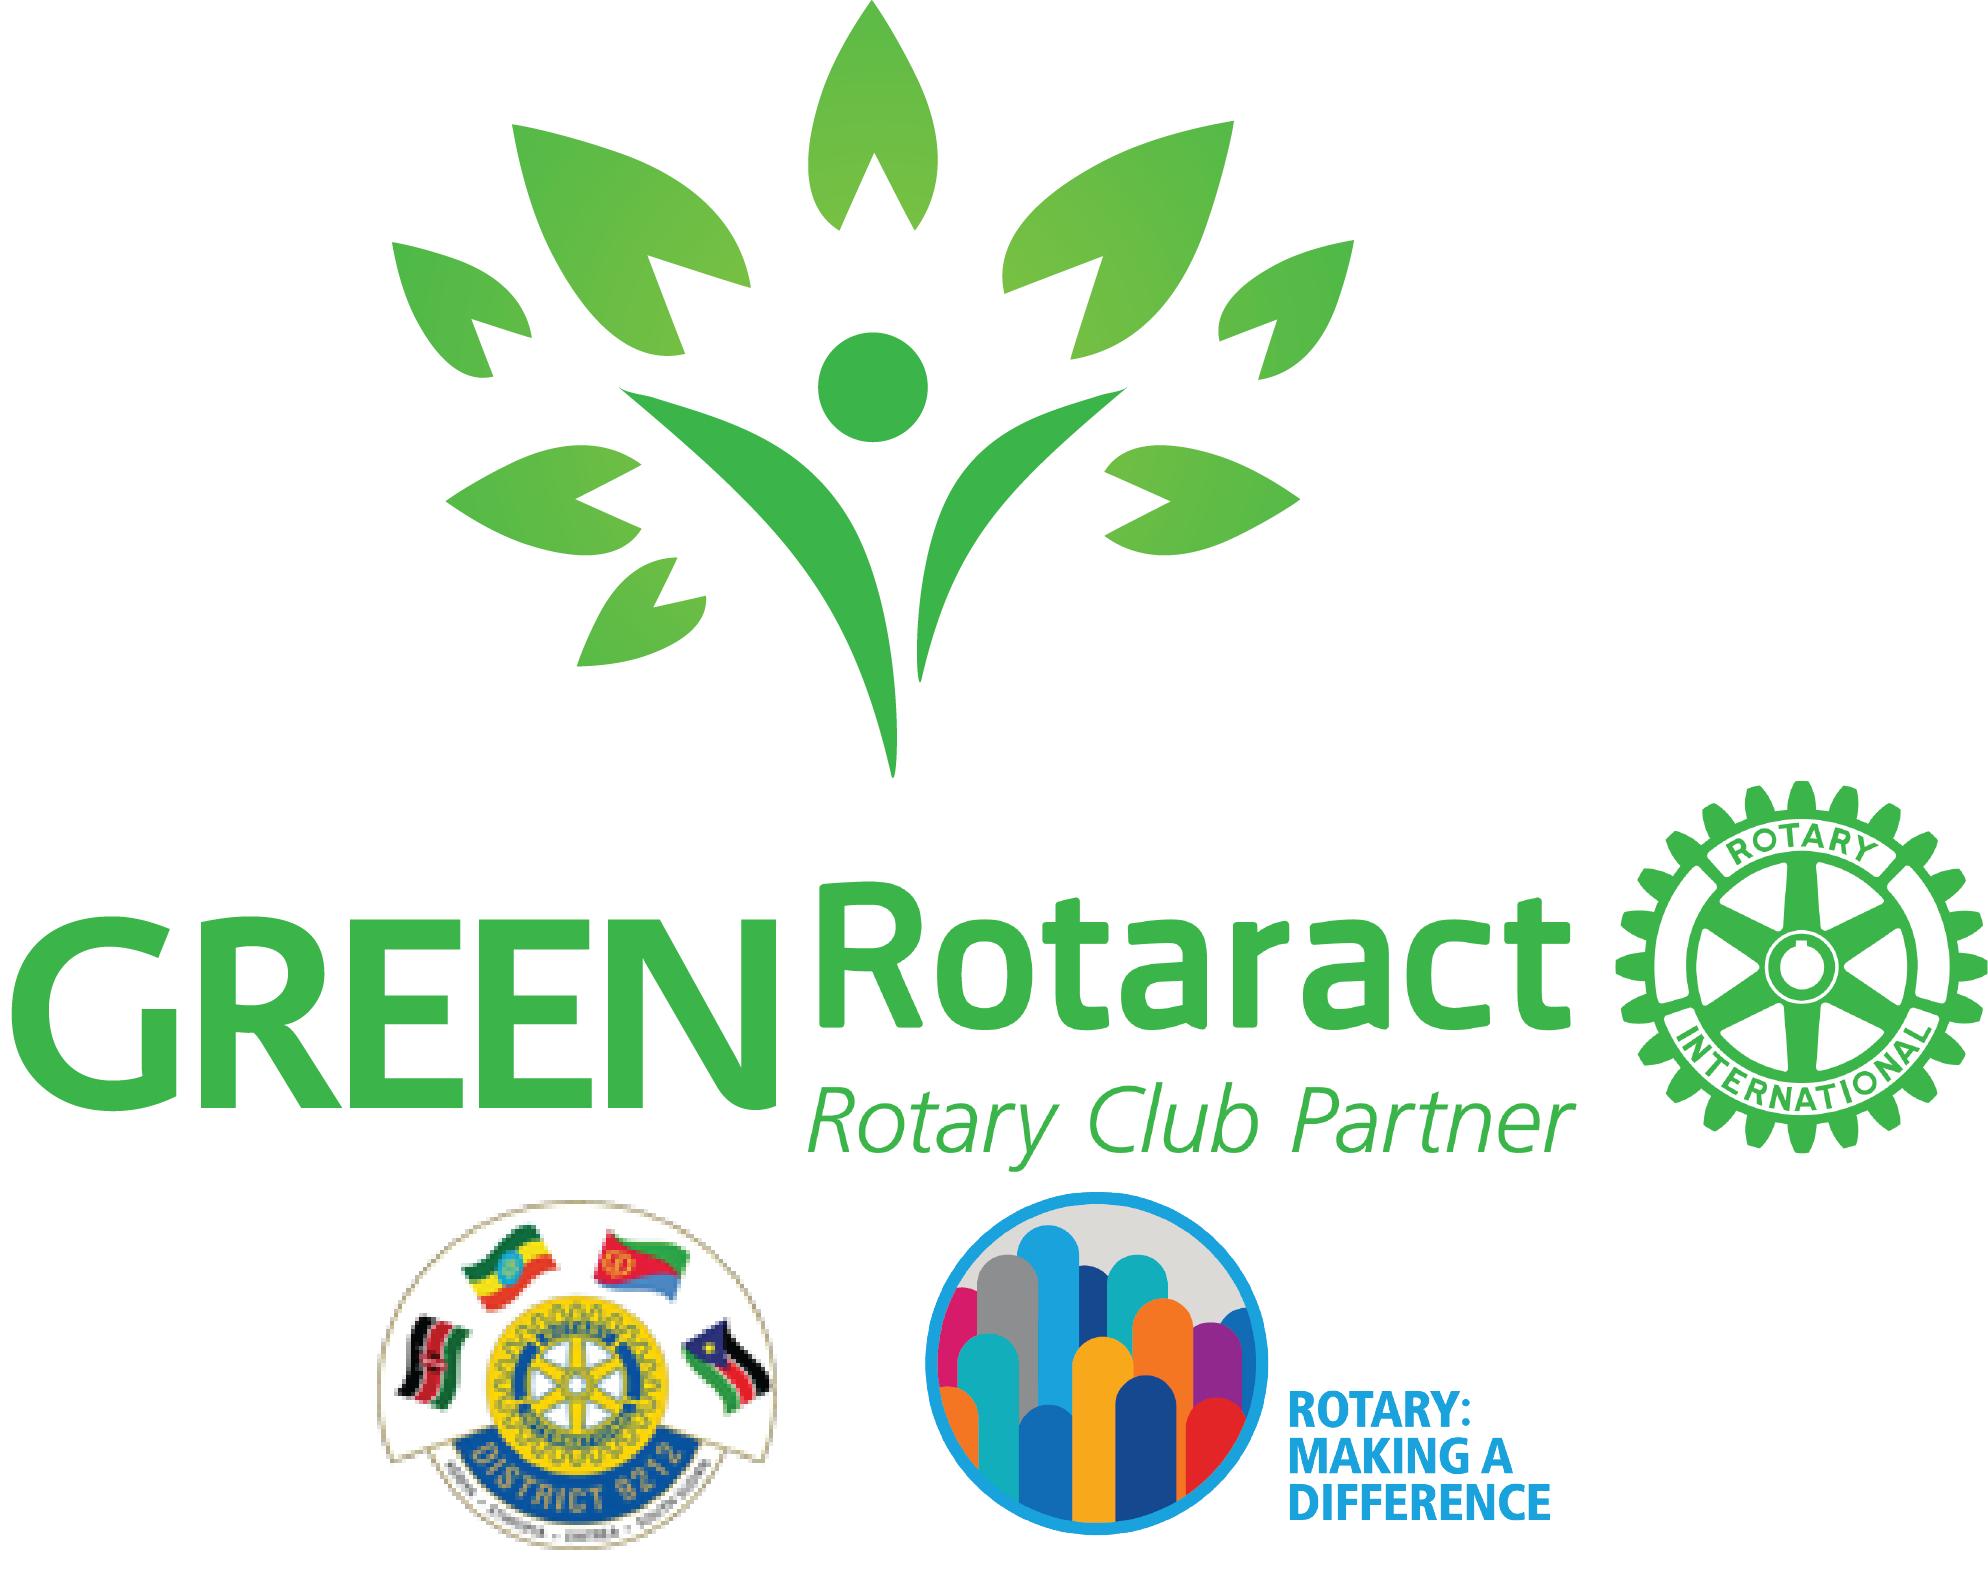 Green_Rotaract_2